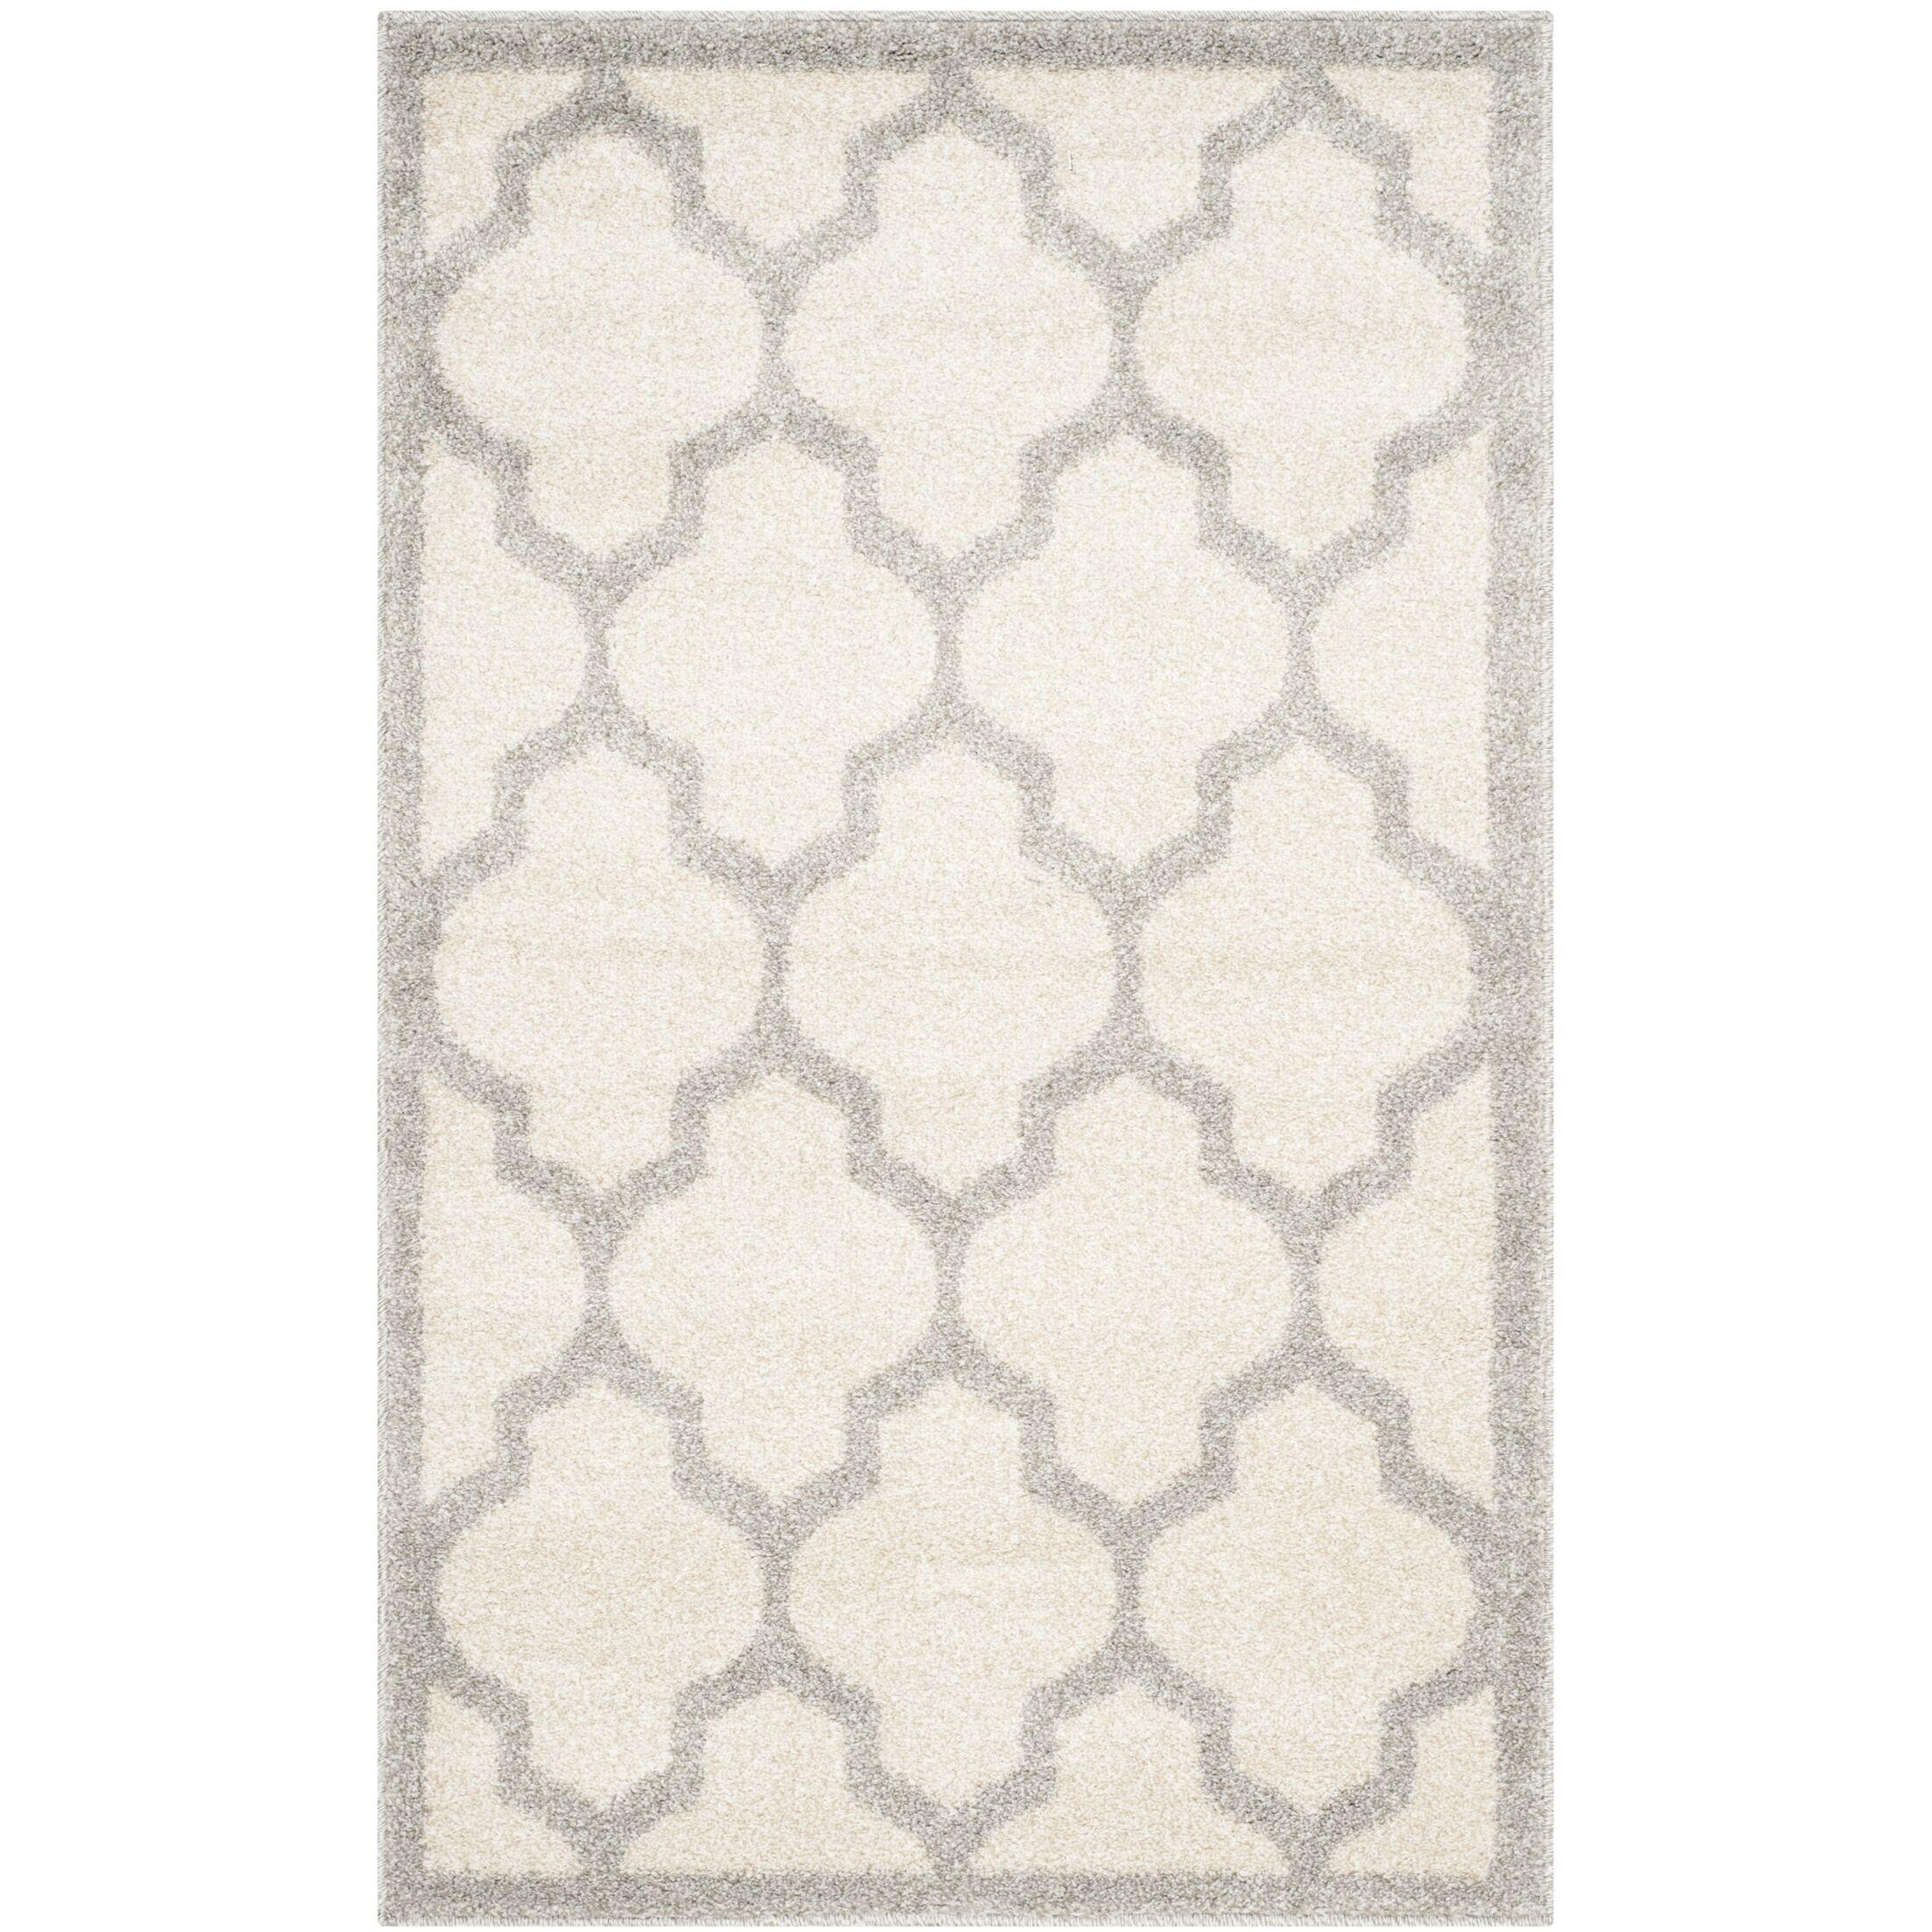 Maritza Beige/Light Grey Flat Woven Area Rug Rug Size: Square 9'